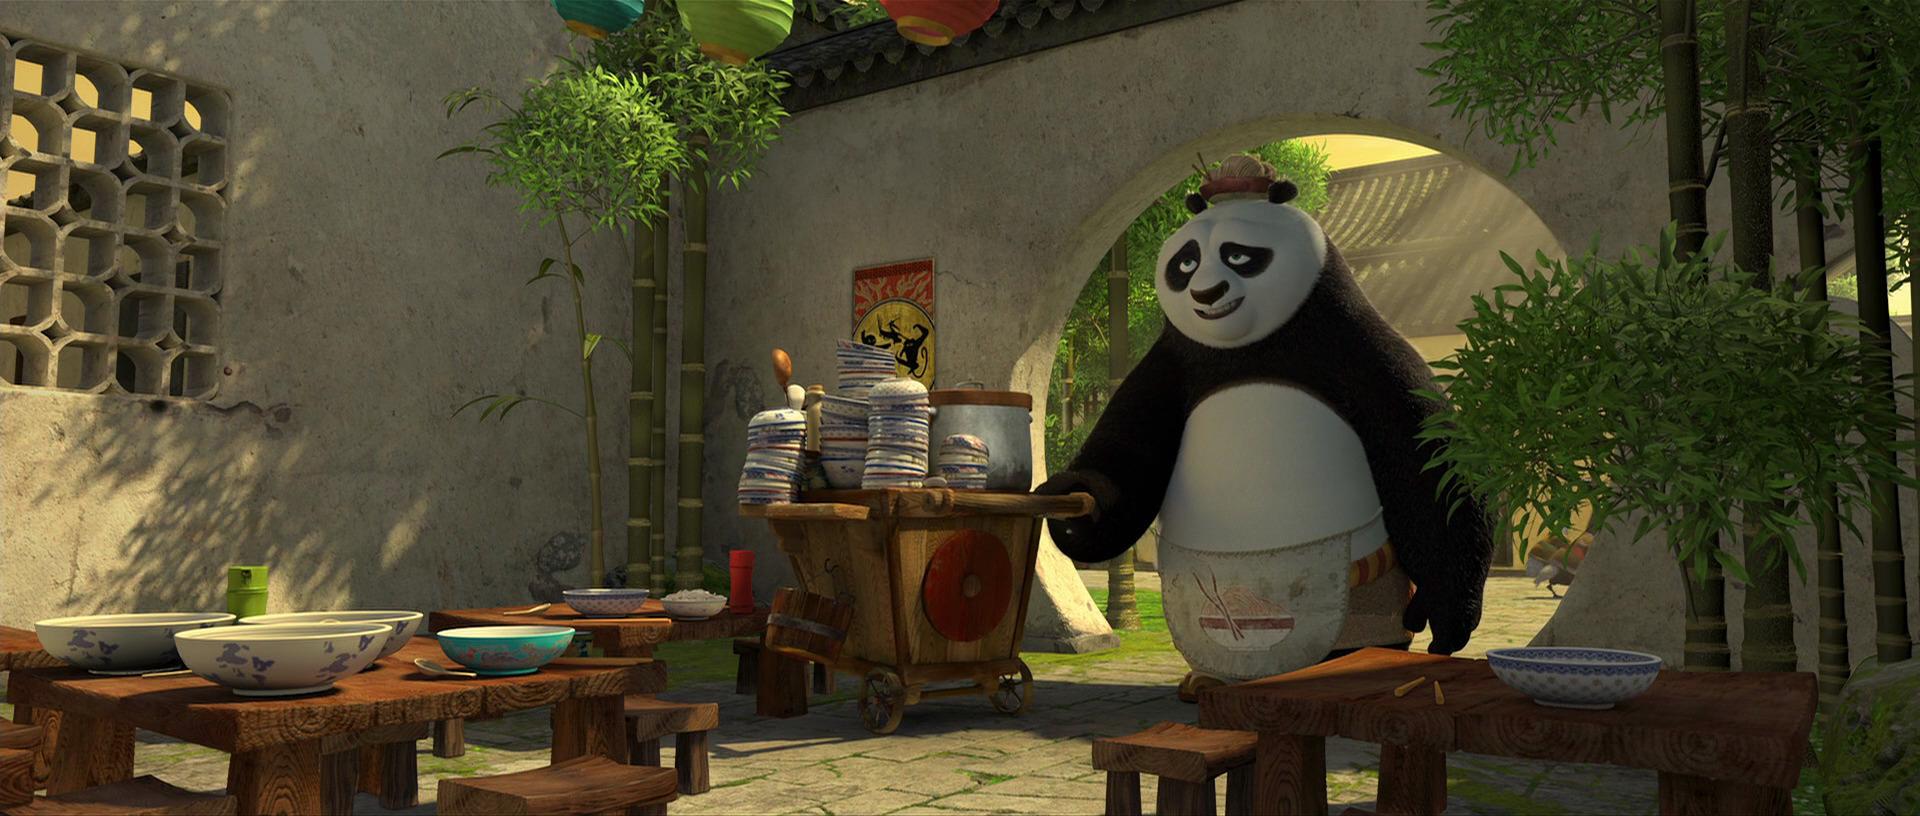 Image - Kungfu-disneyscreencaps.com-1044.jpg | Kung Fu Panda Wiki ...